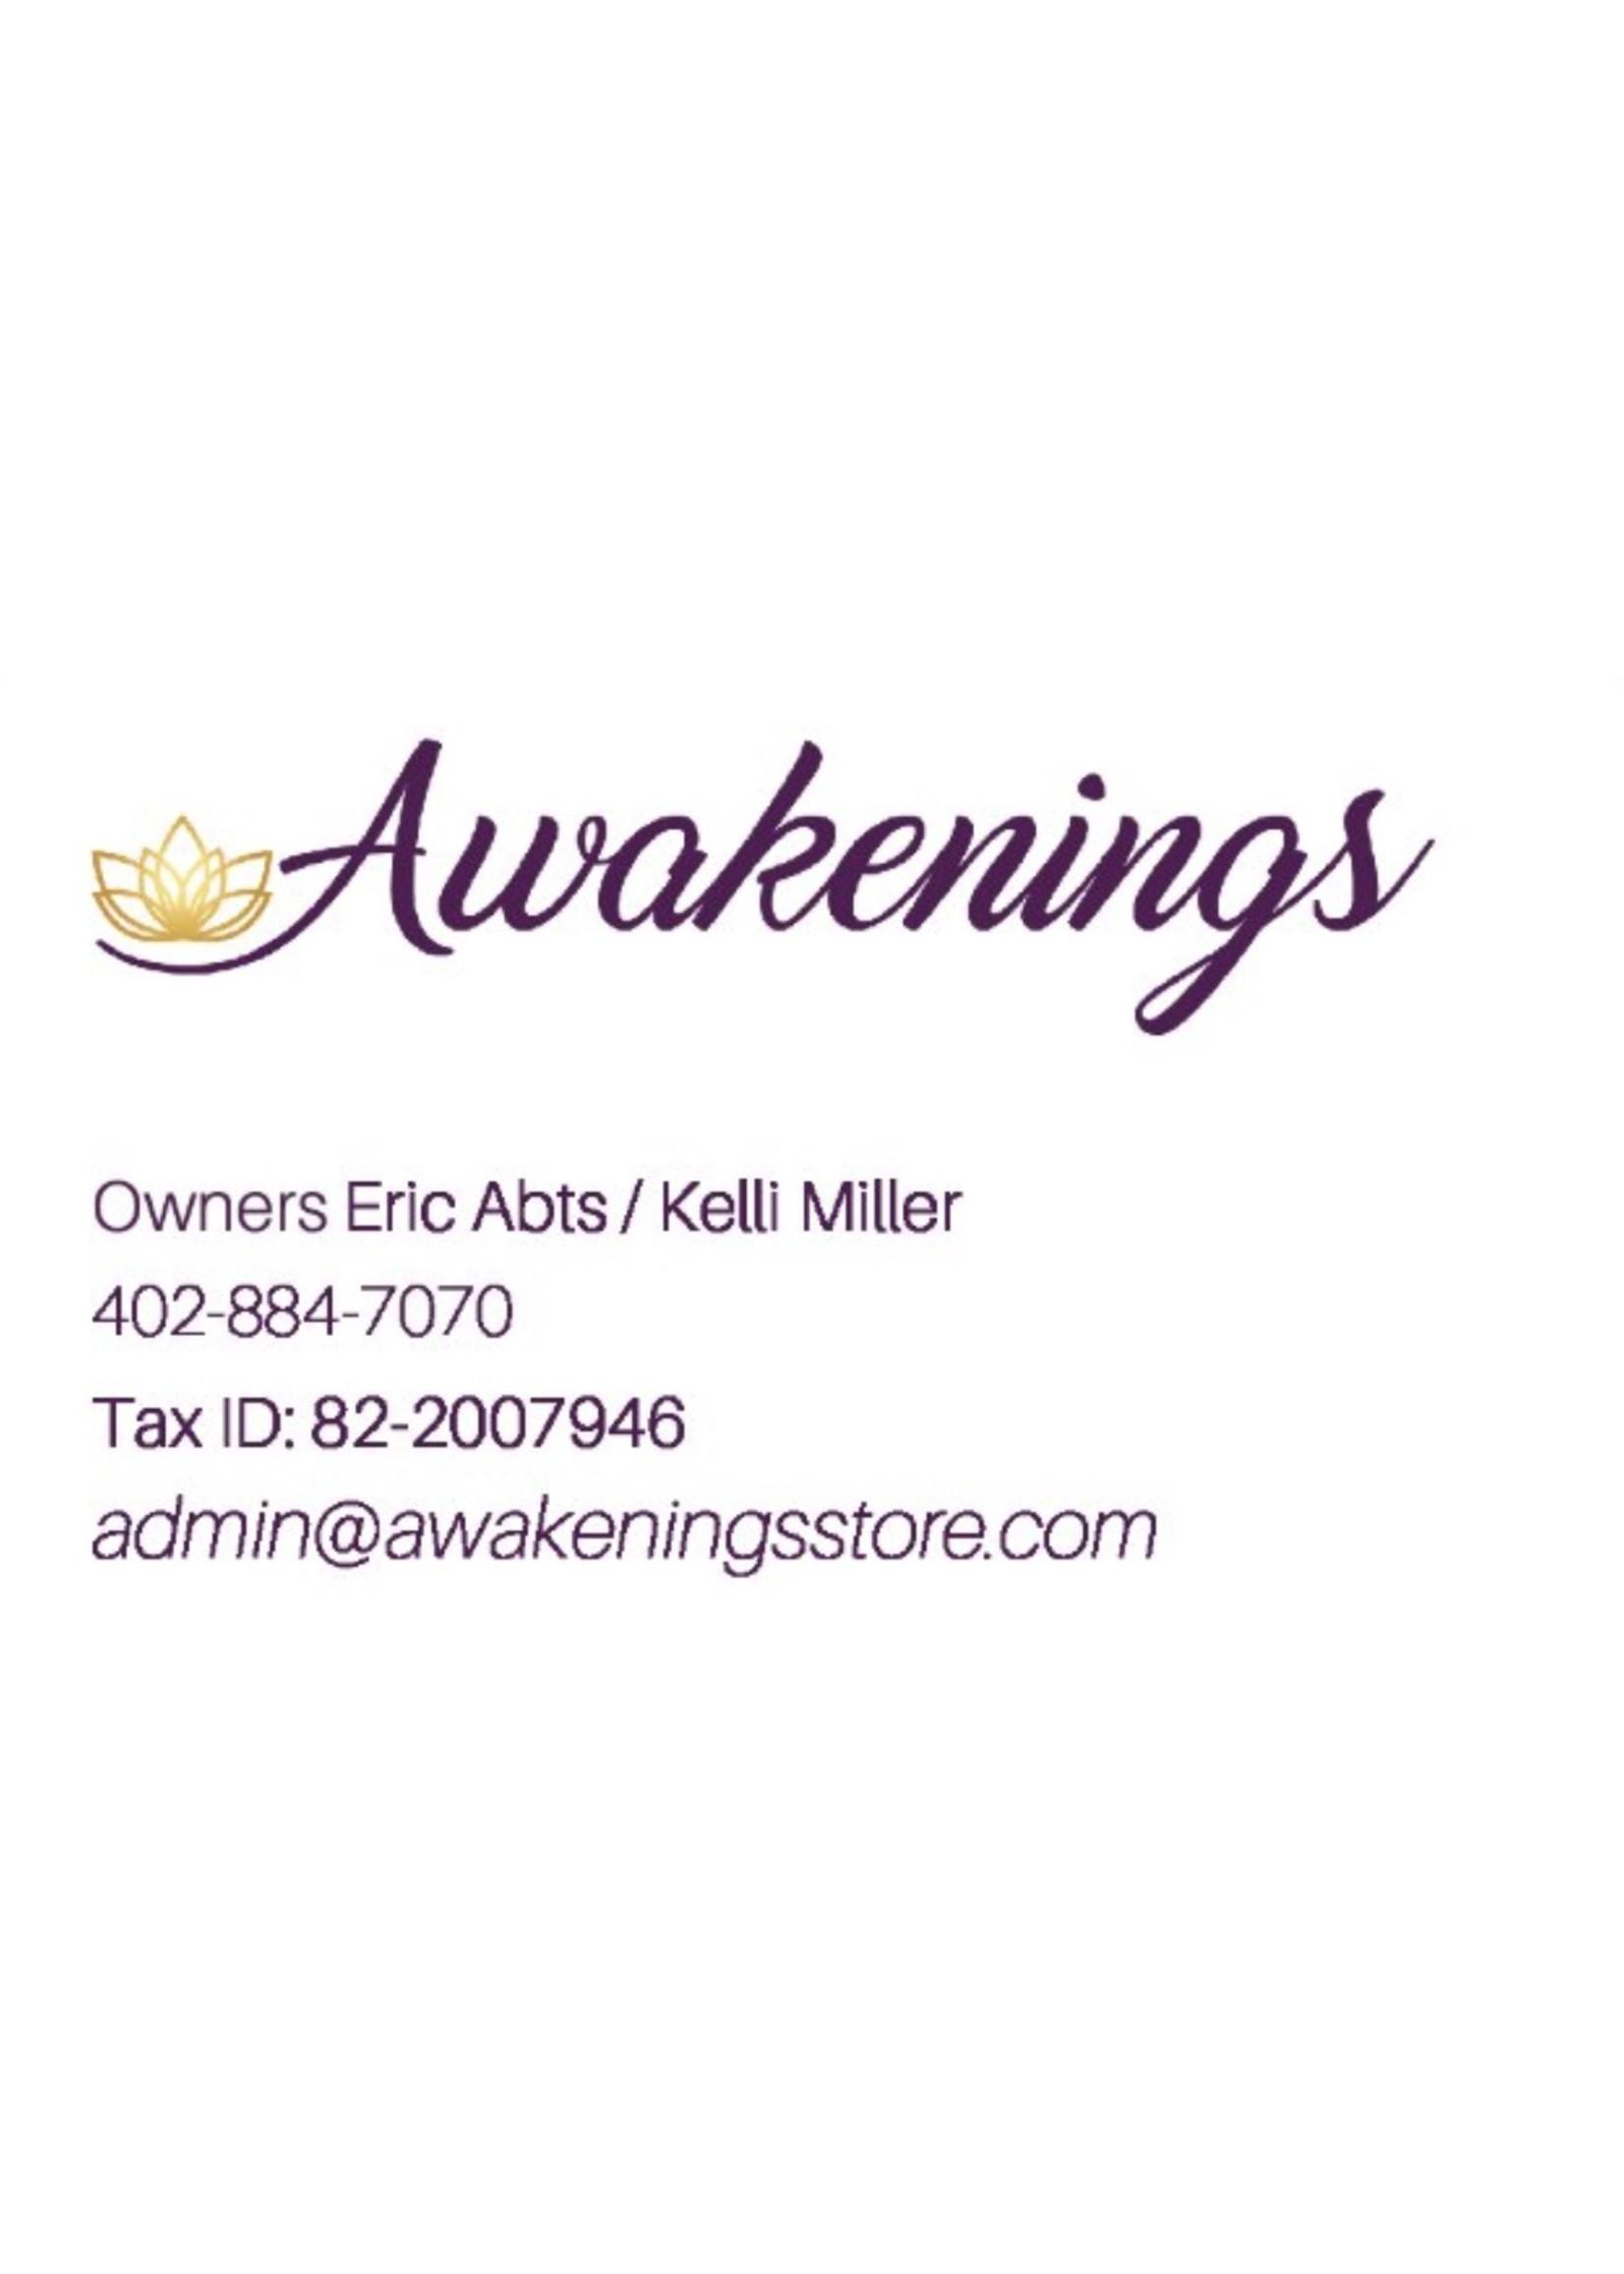 Awakenings Tax ID Business Card - Box of 500